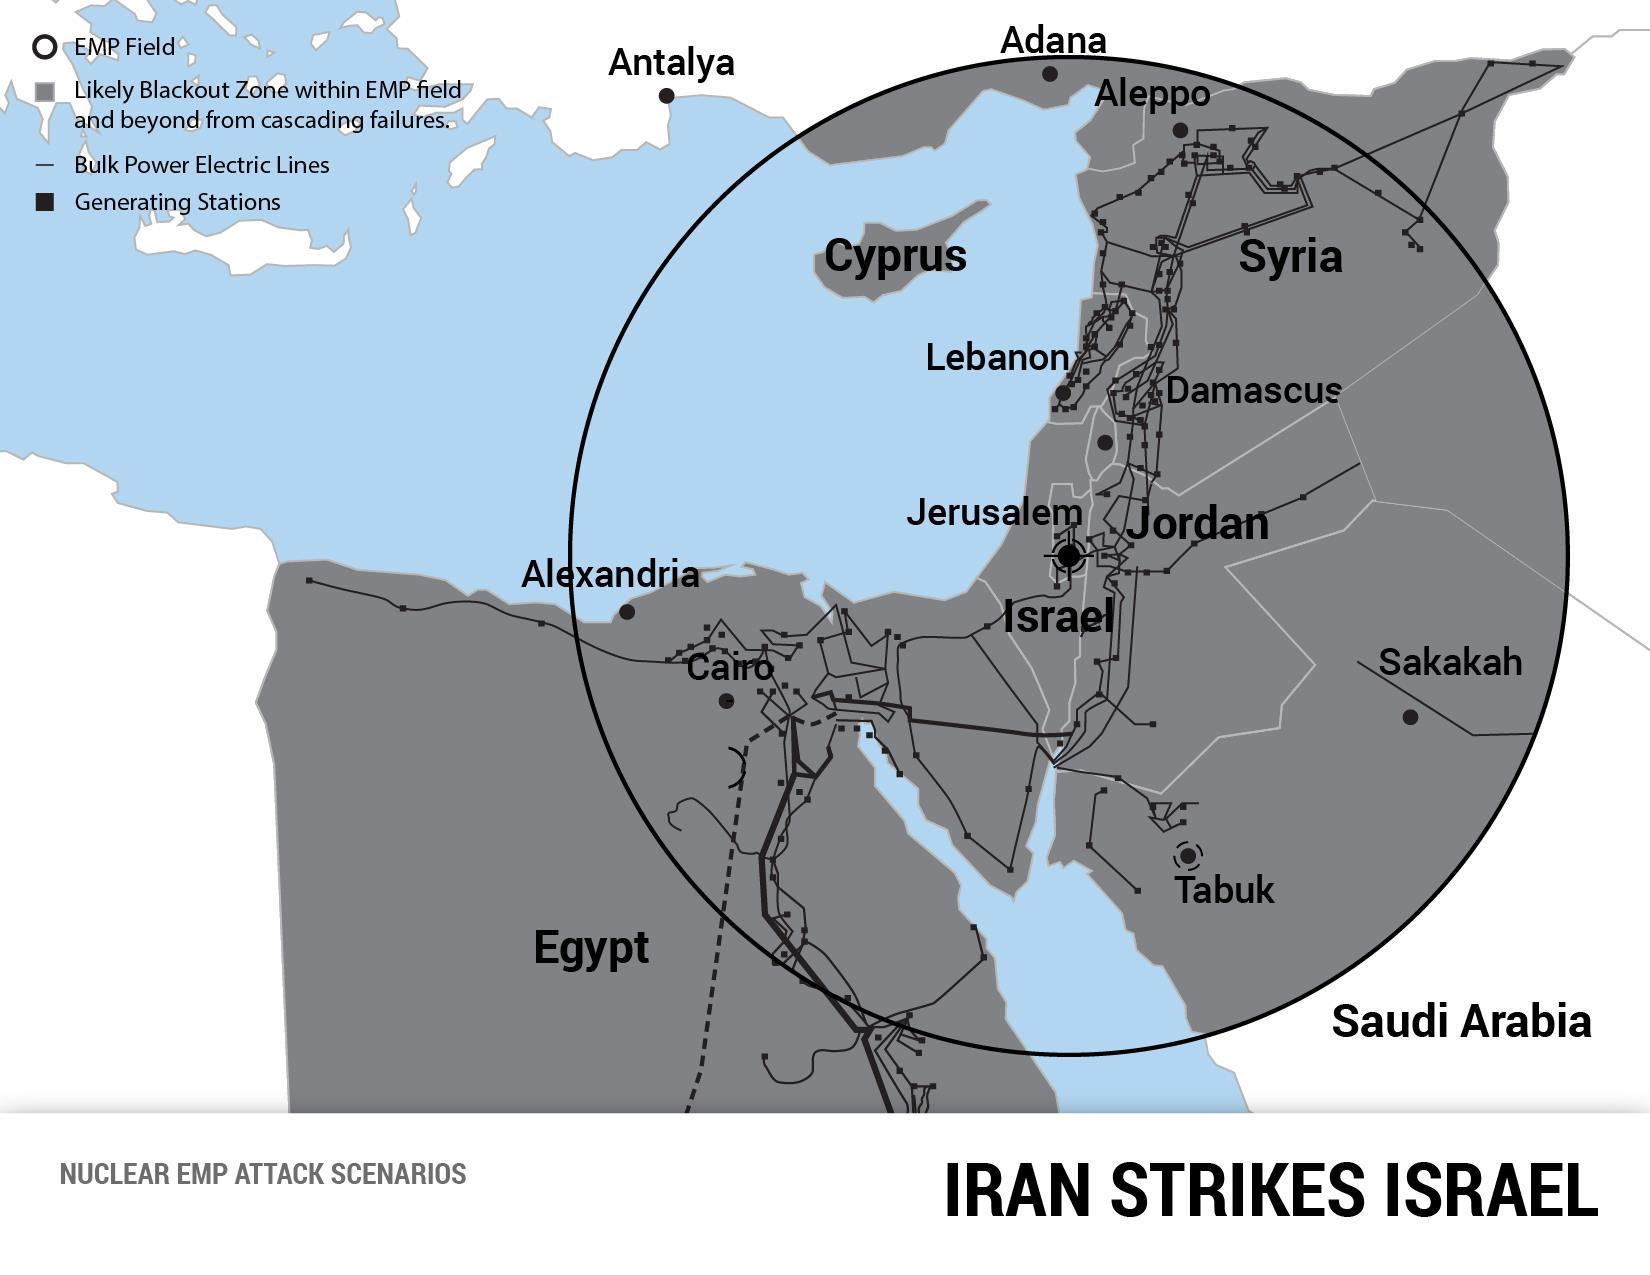 IranEMPonIsrael